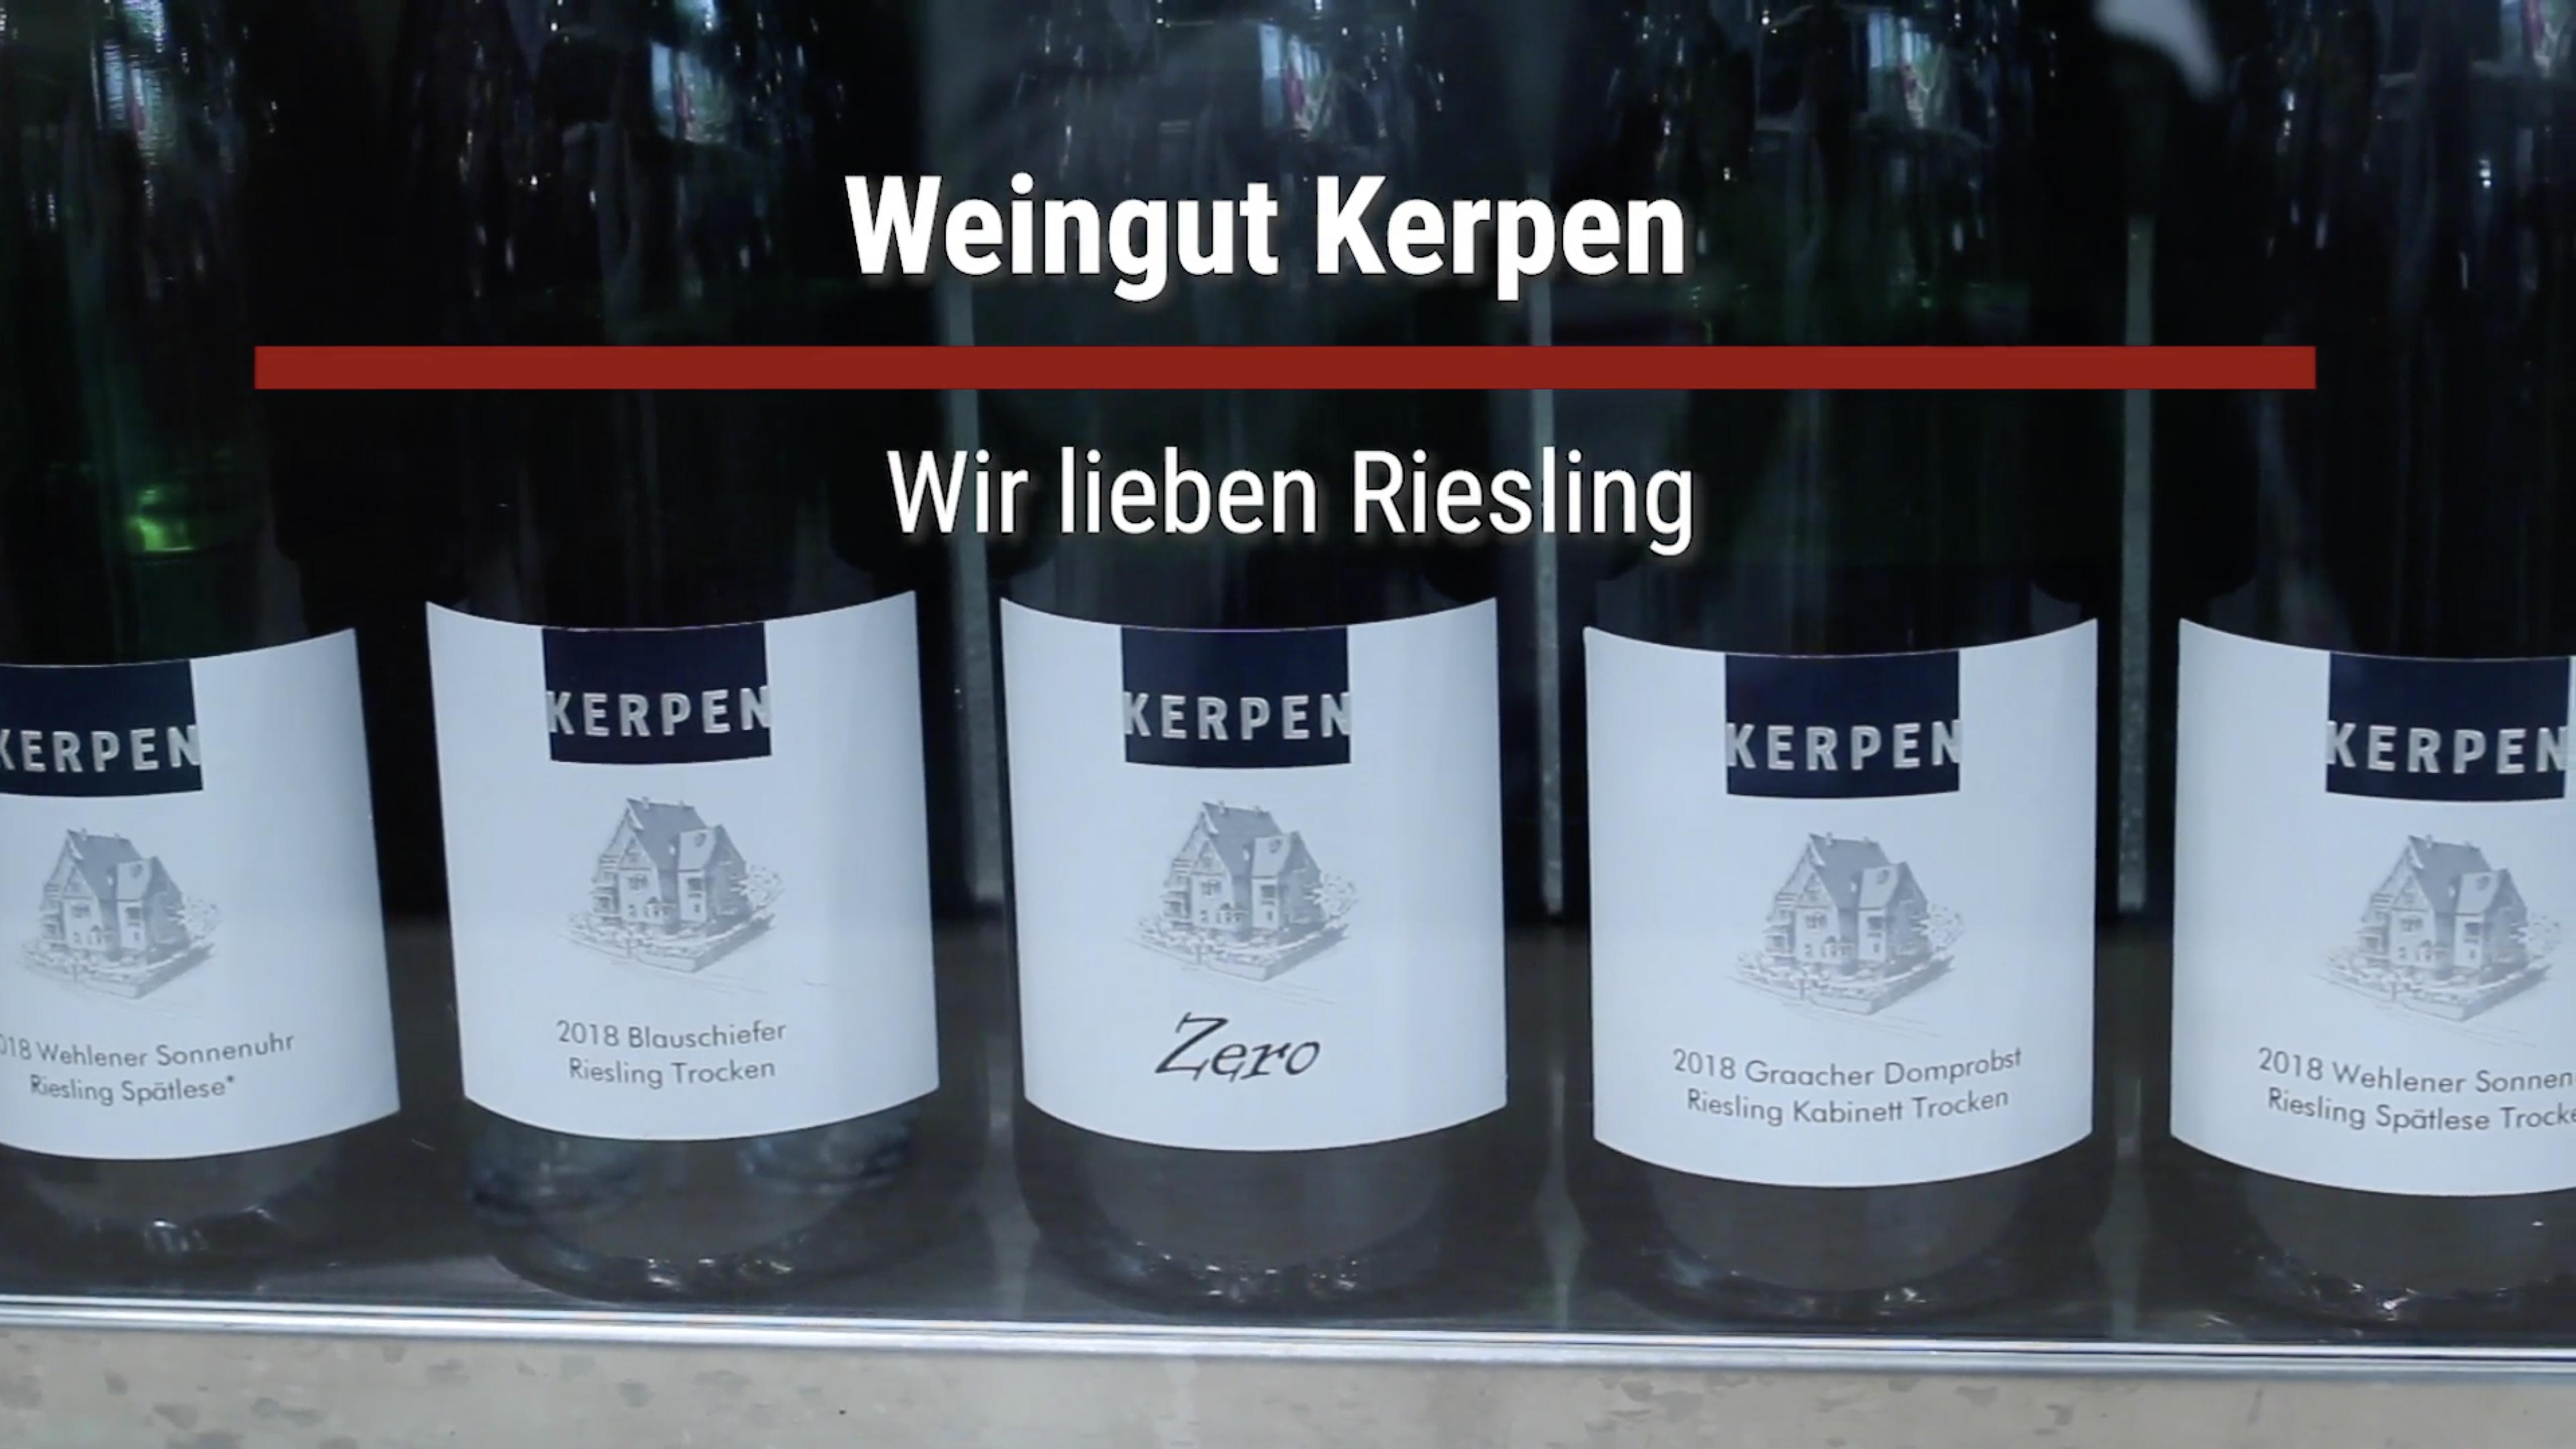 Weingut Kerpen – ProWein 2019